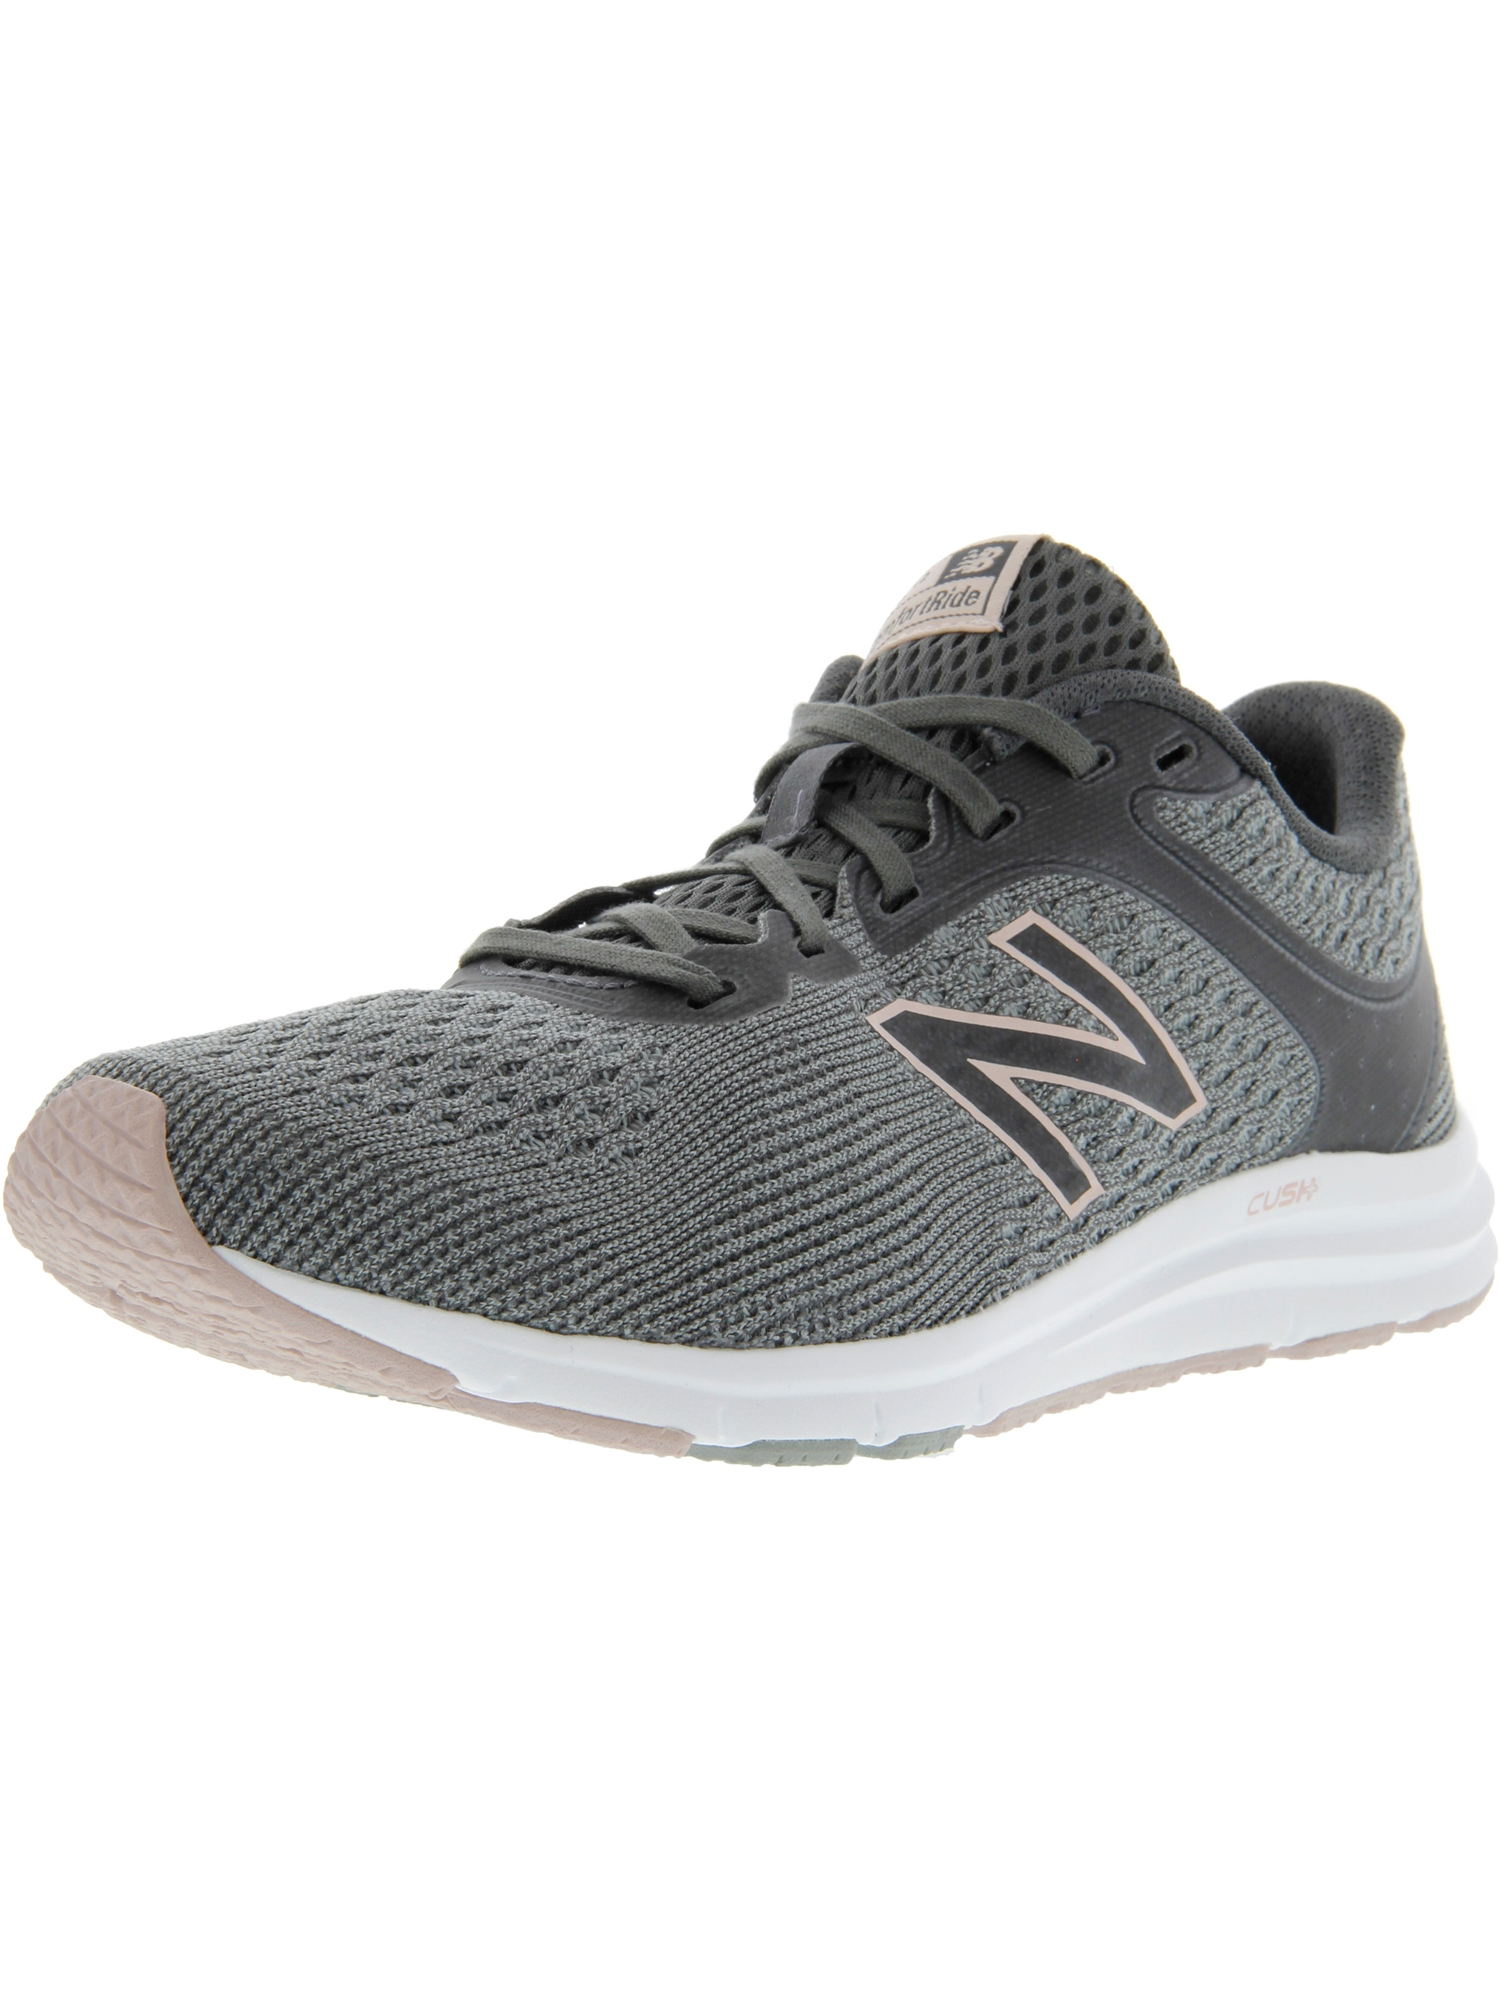 New Balance W635 Running Shoe - 10.5W